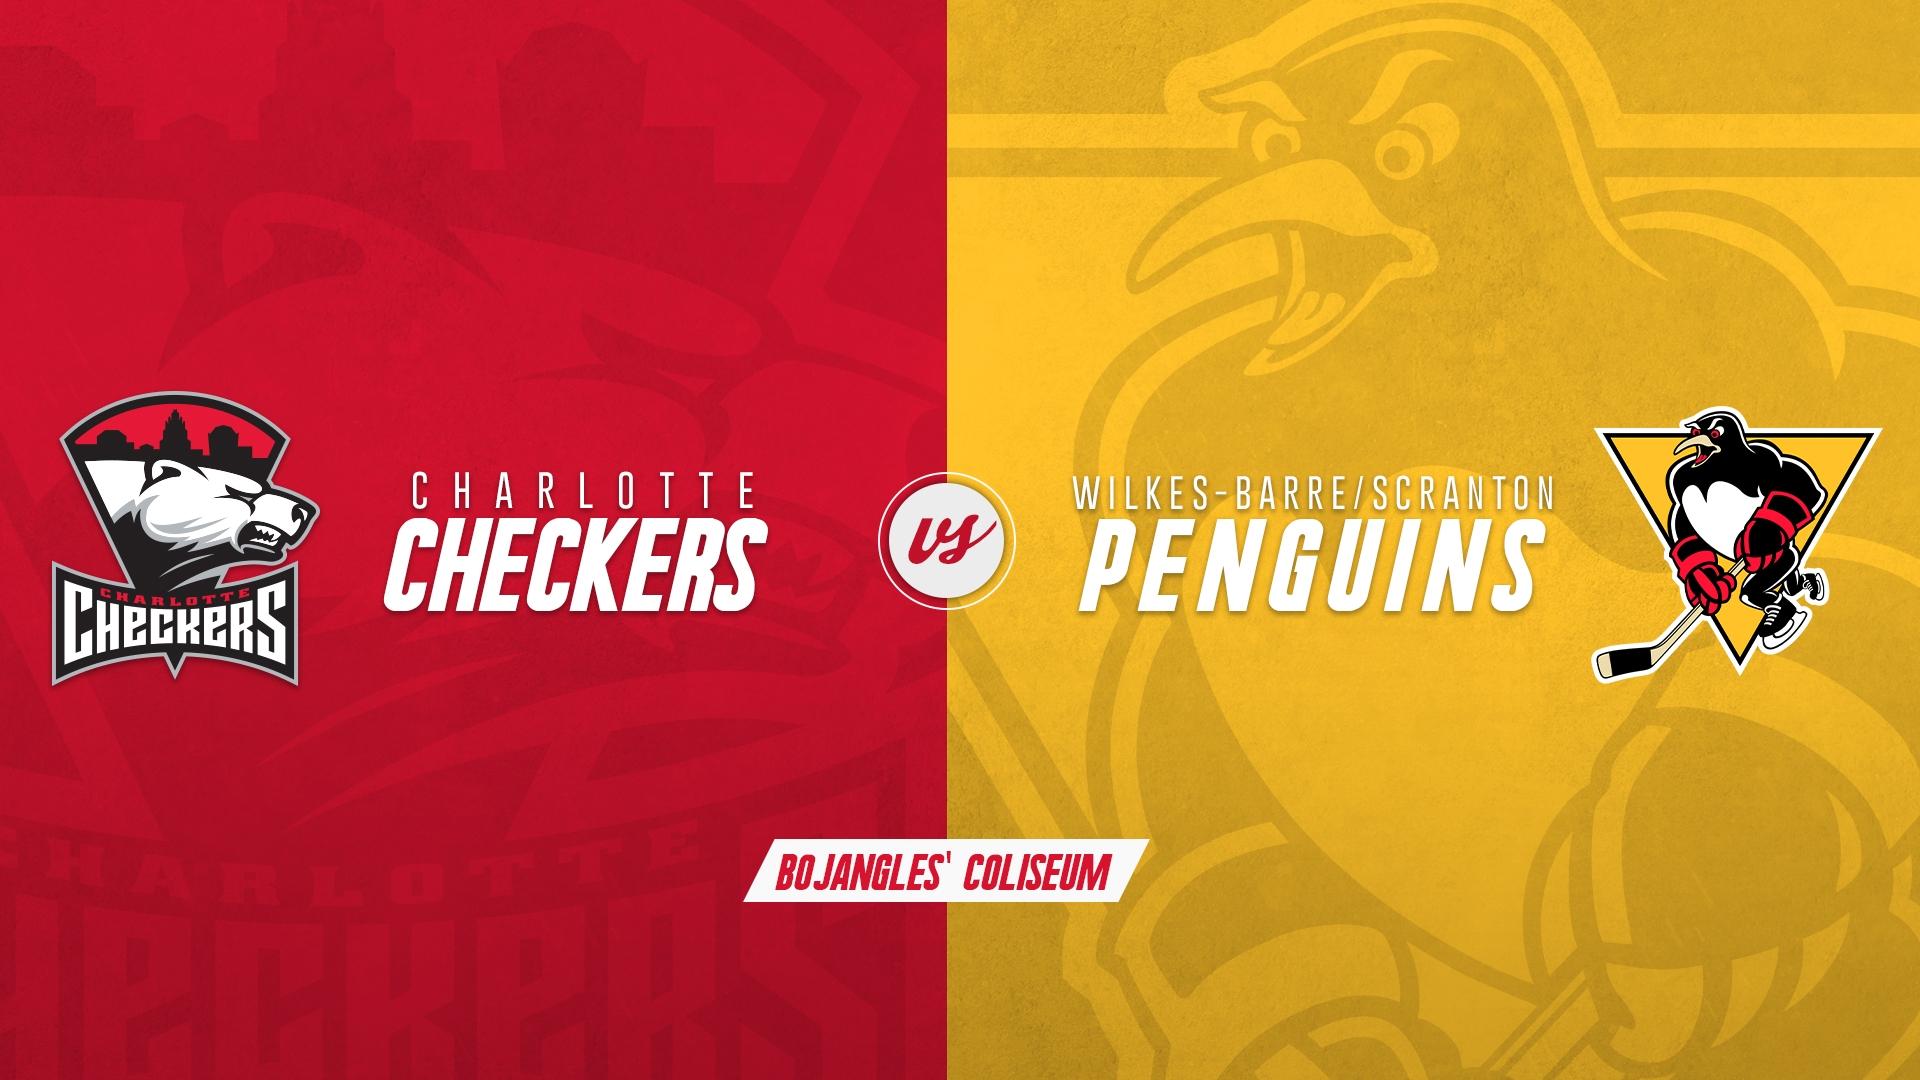 Charlotte Checkers vs. Wilkes Barre Scranton Penguins